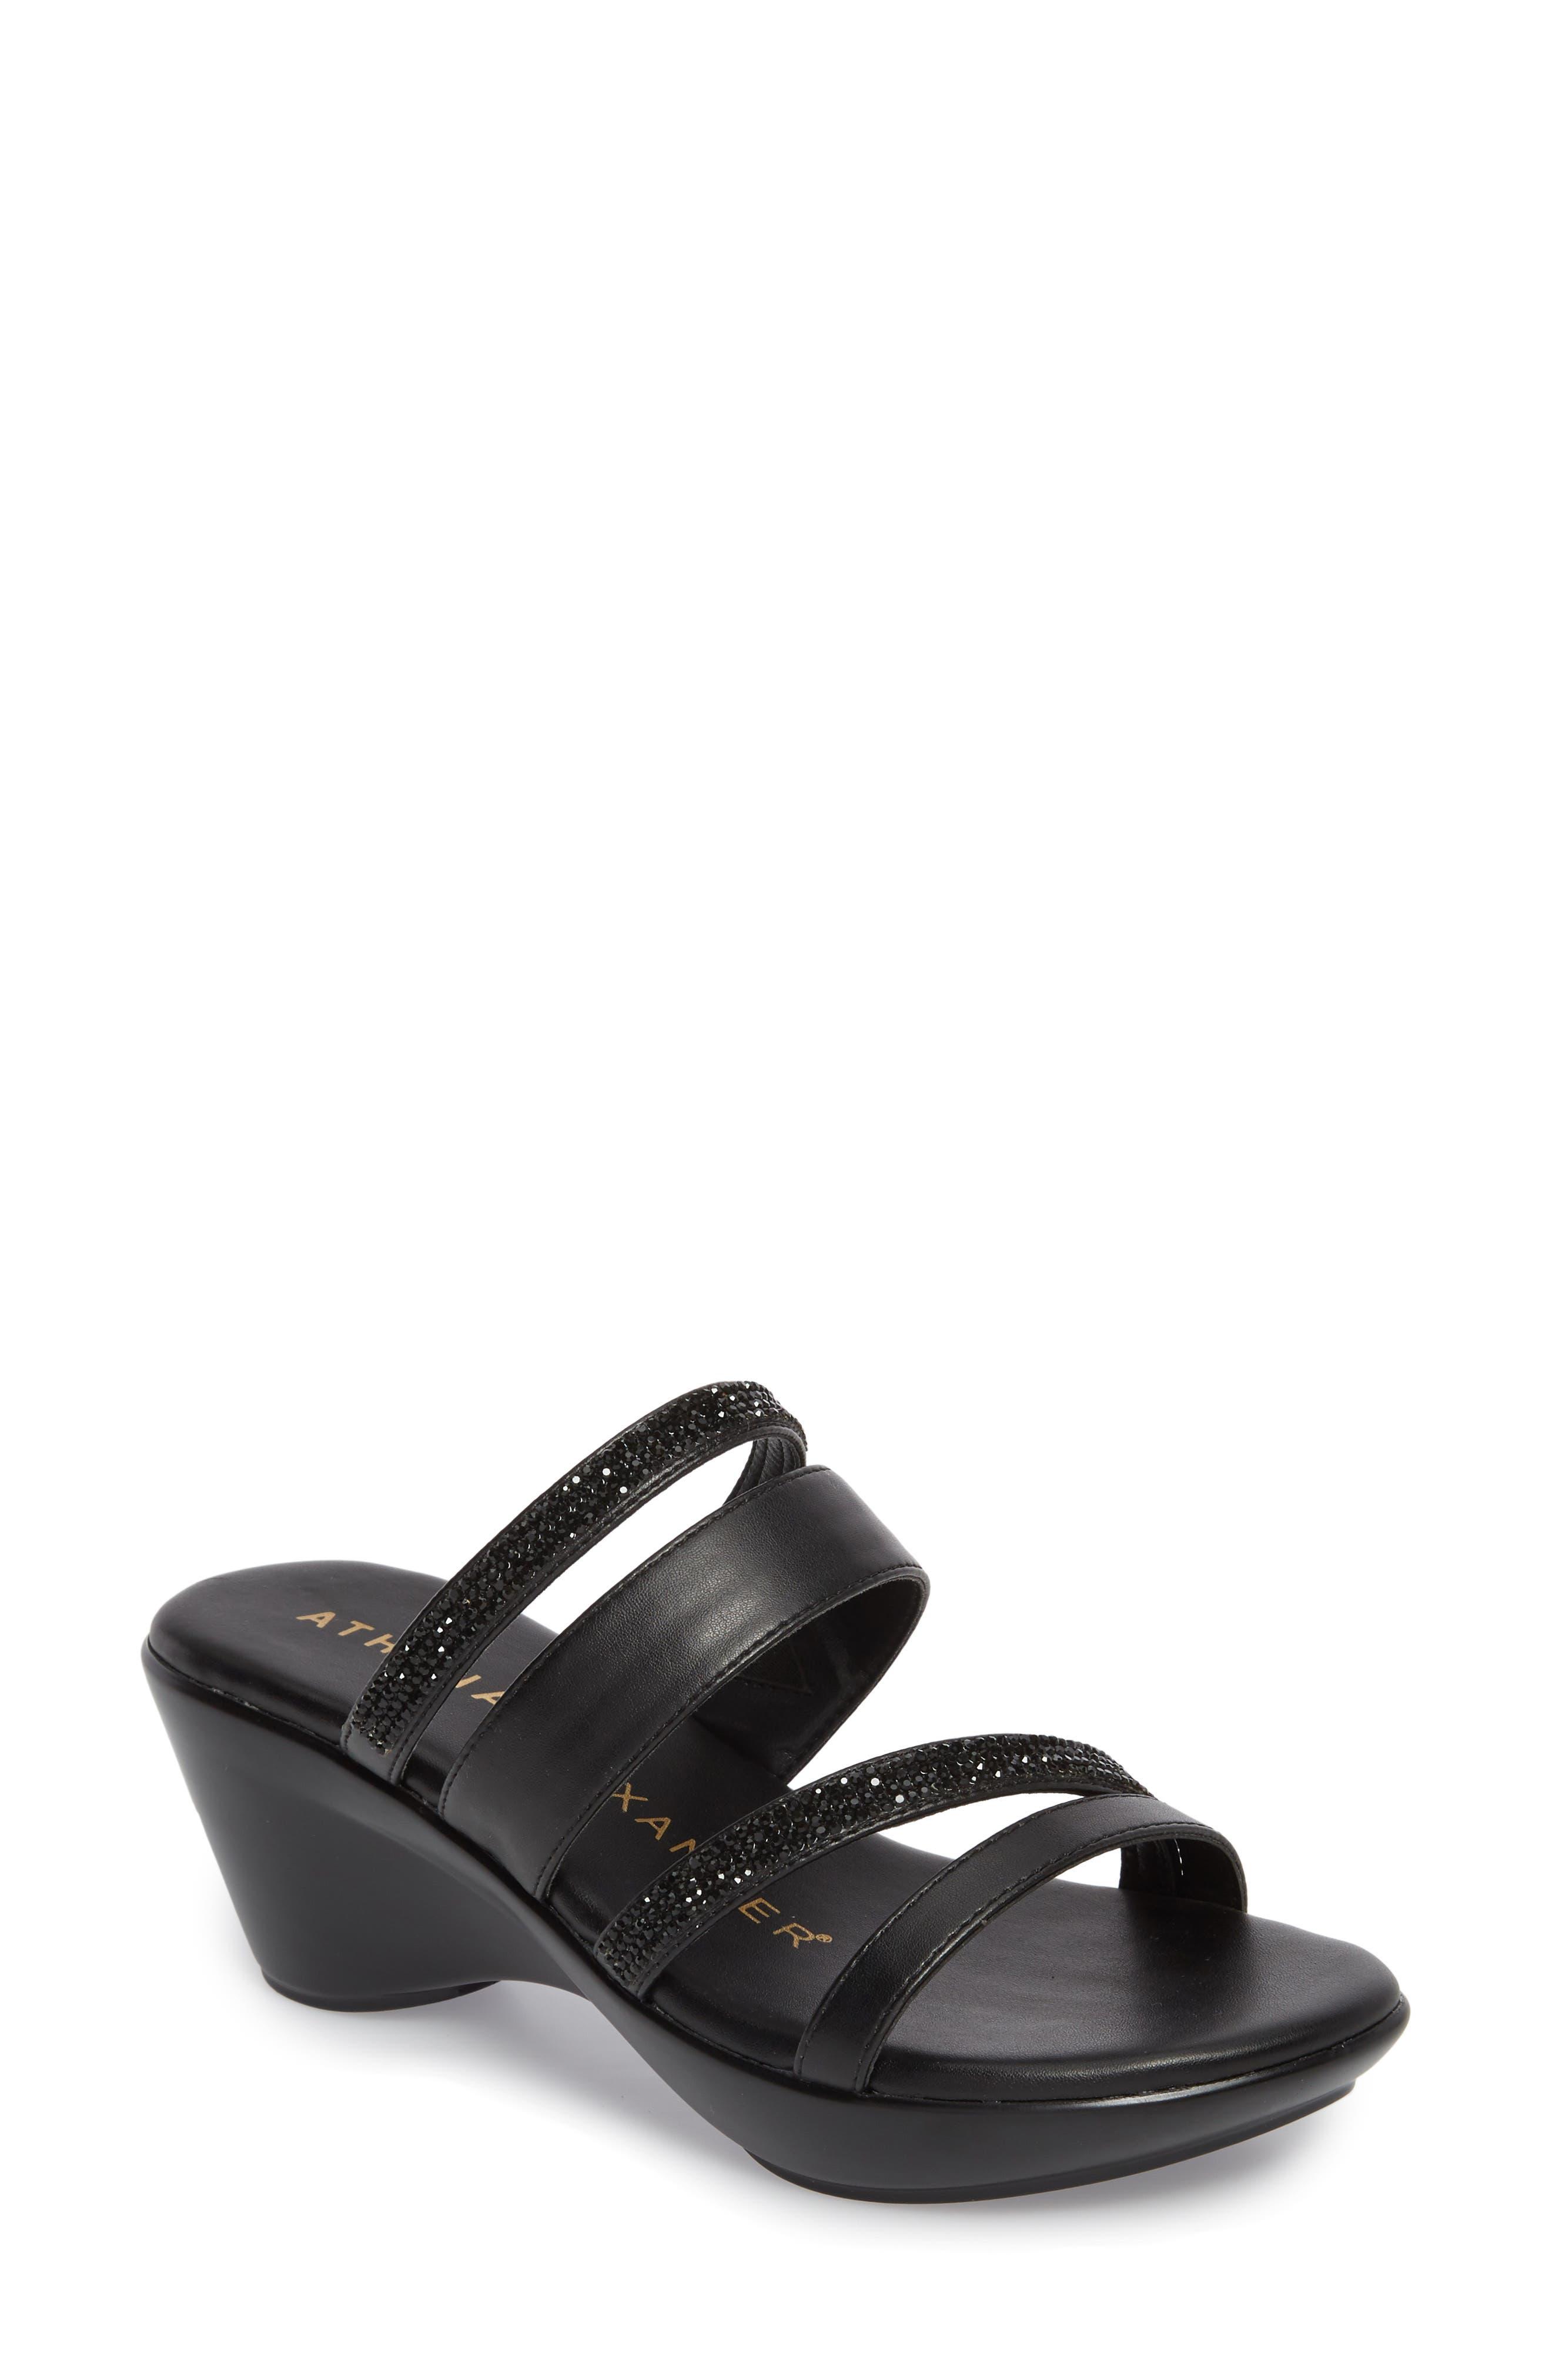 Kozima Embellished Sandal,                             Main thumbnail 1, color,                             BLACK FABRIC